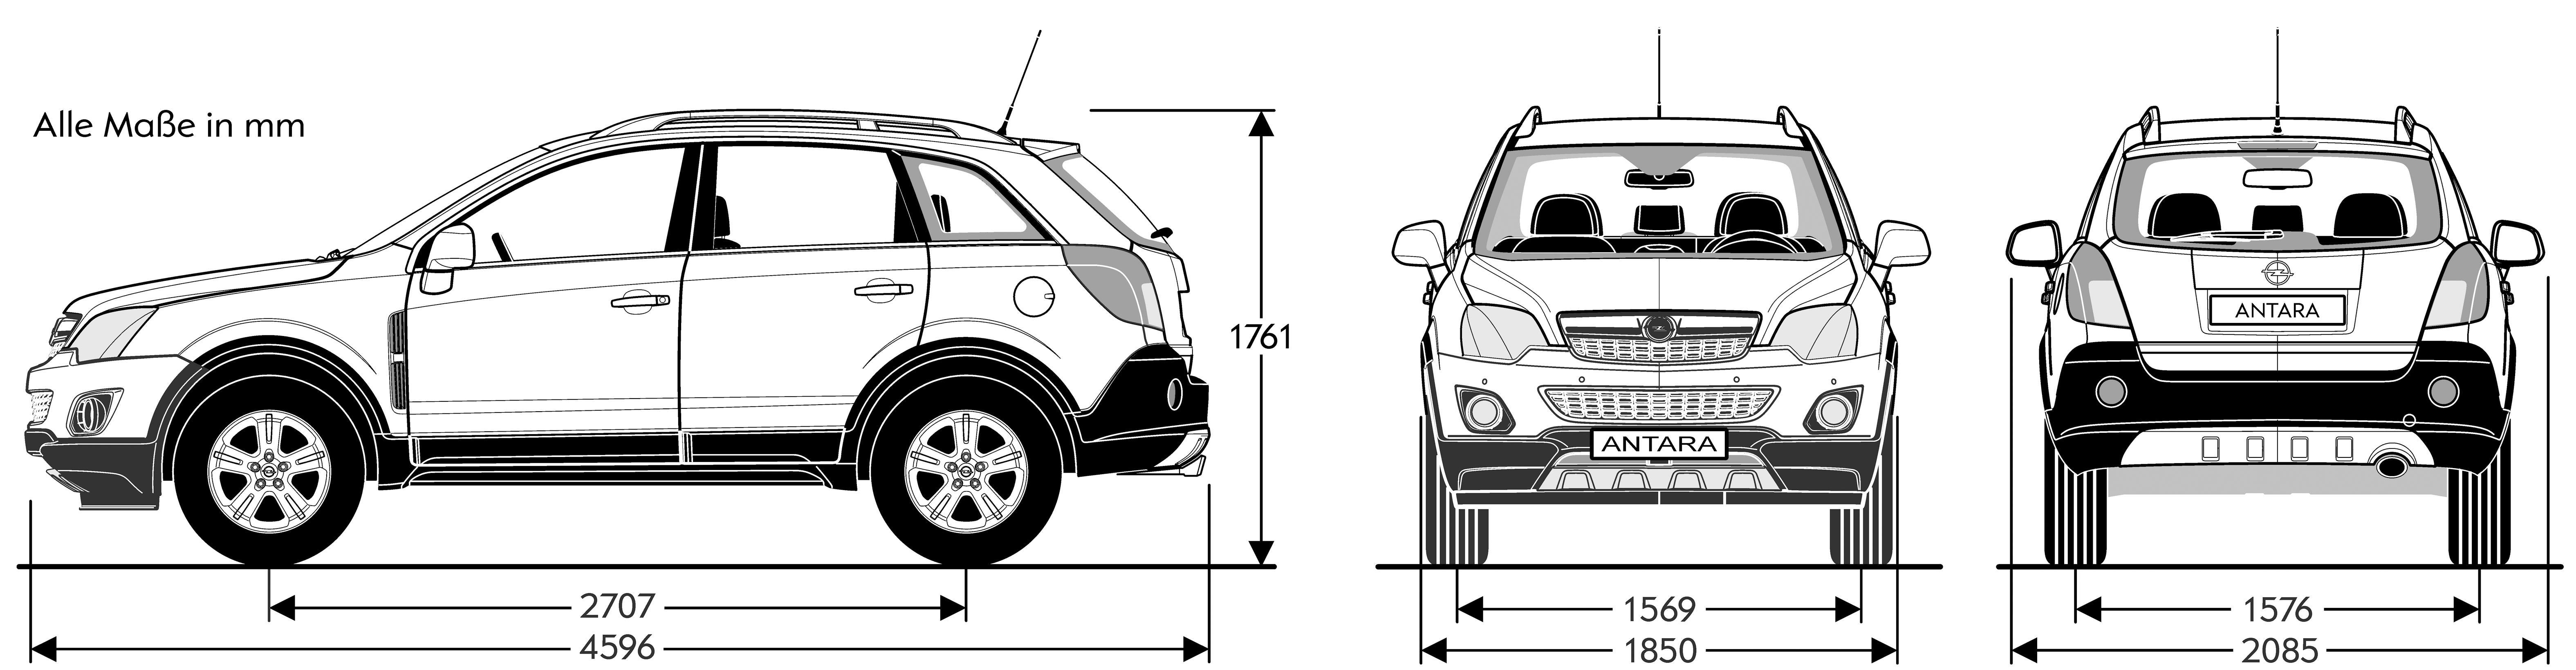 Opel Antara blueprint